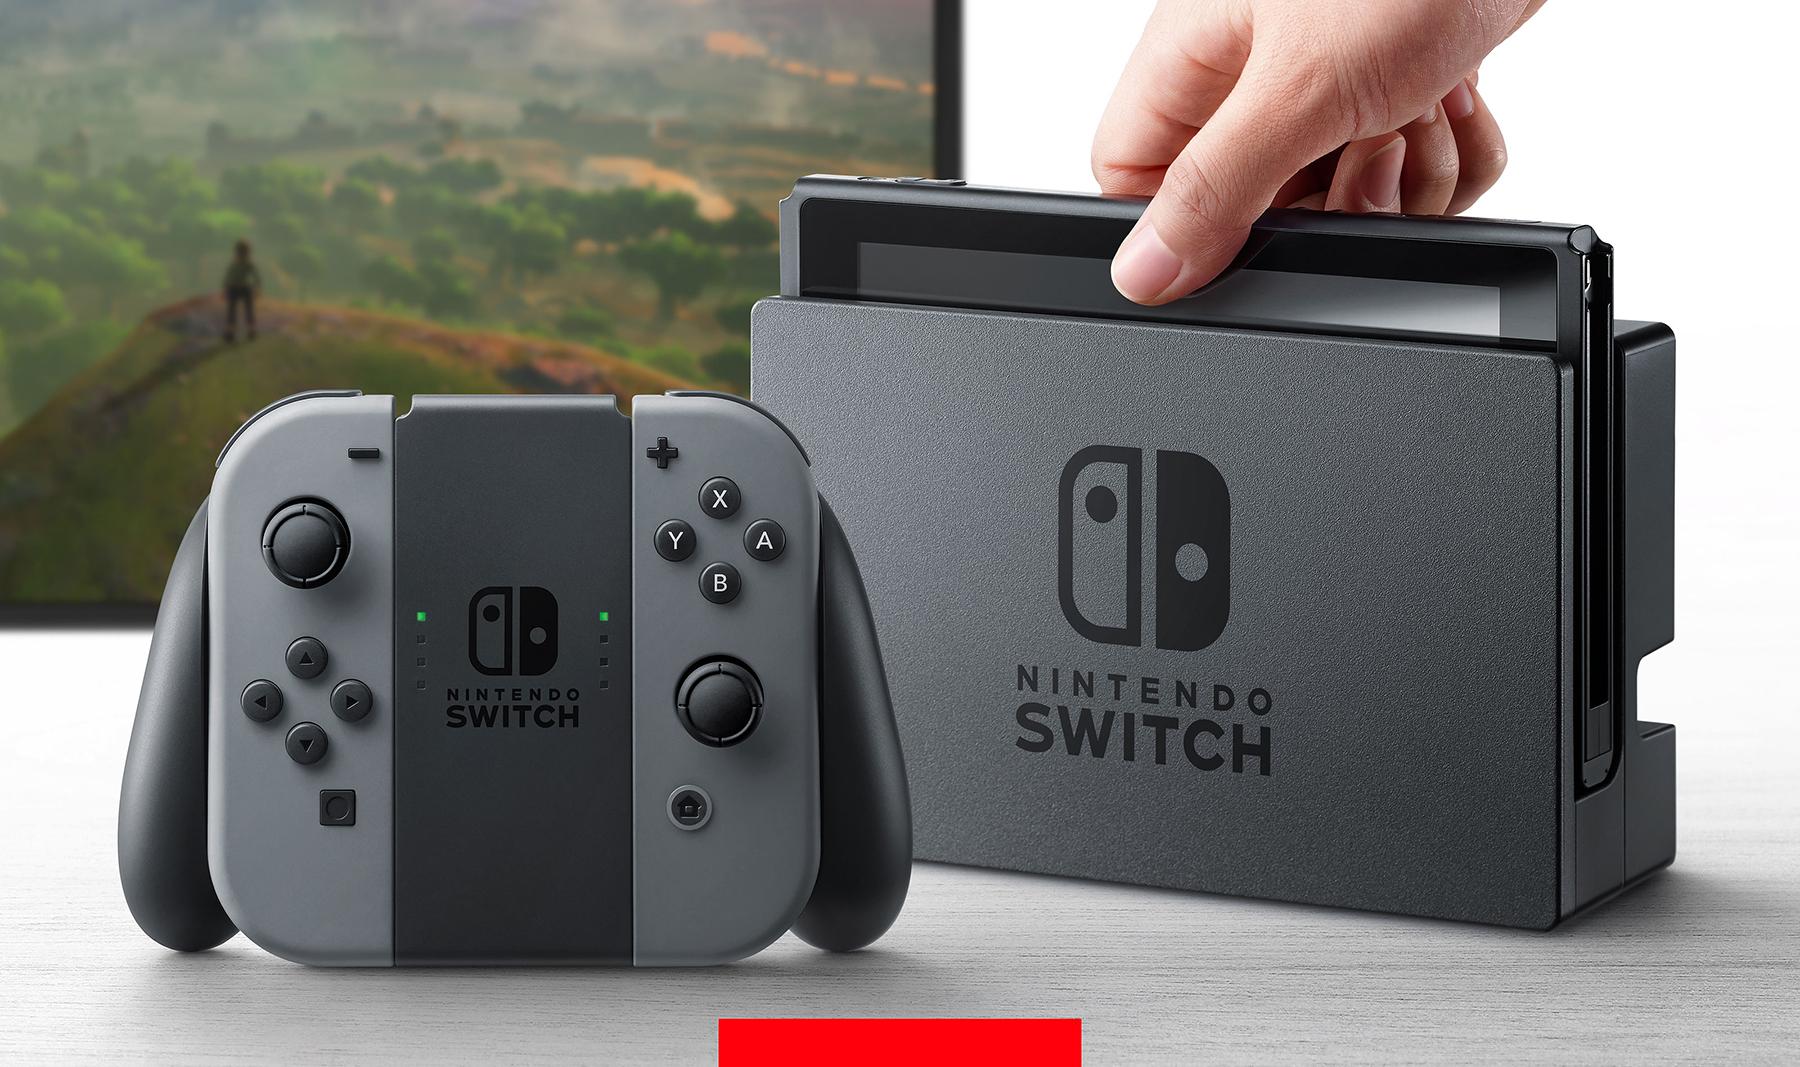 8ae95d9d1 Nintendo pripravuje dva nové modely hernej konzoly Switch | TOUCHIT